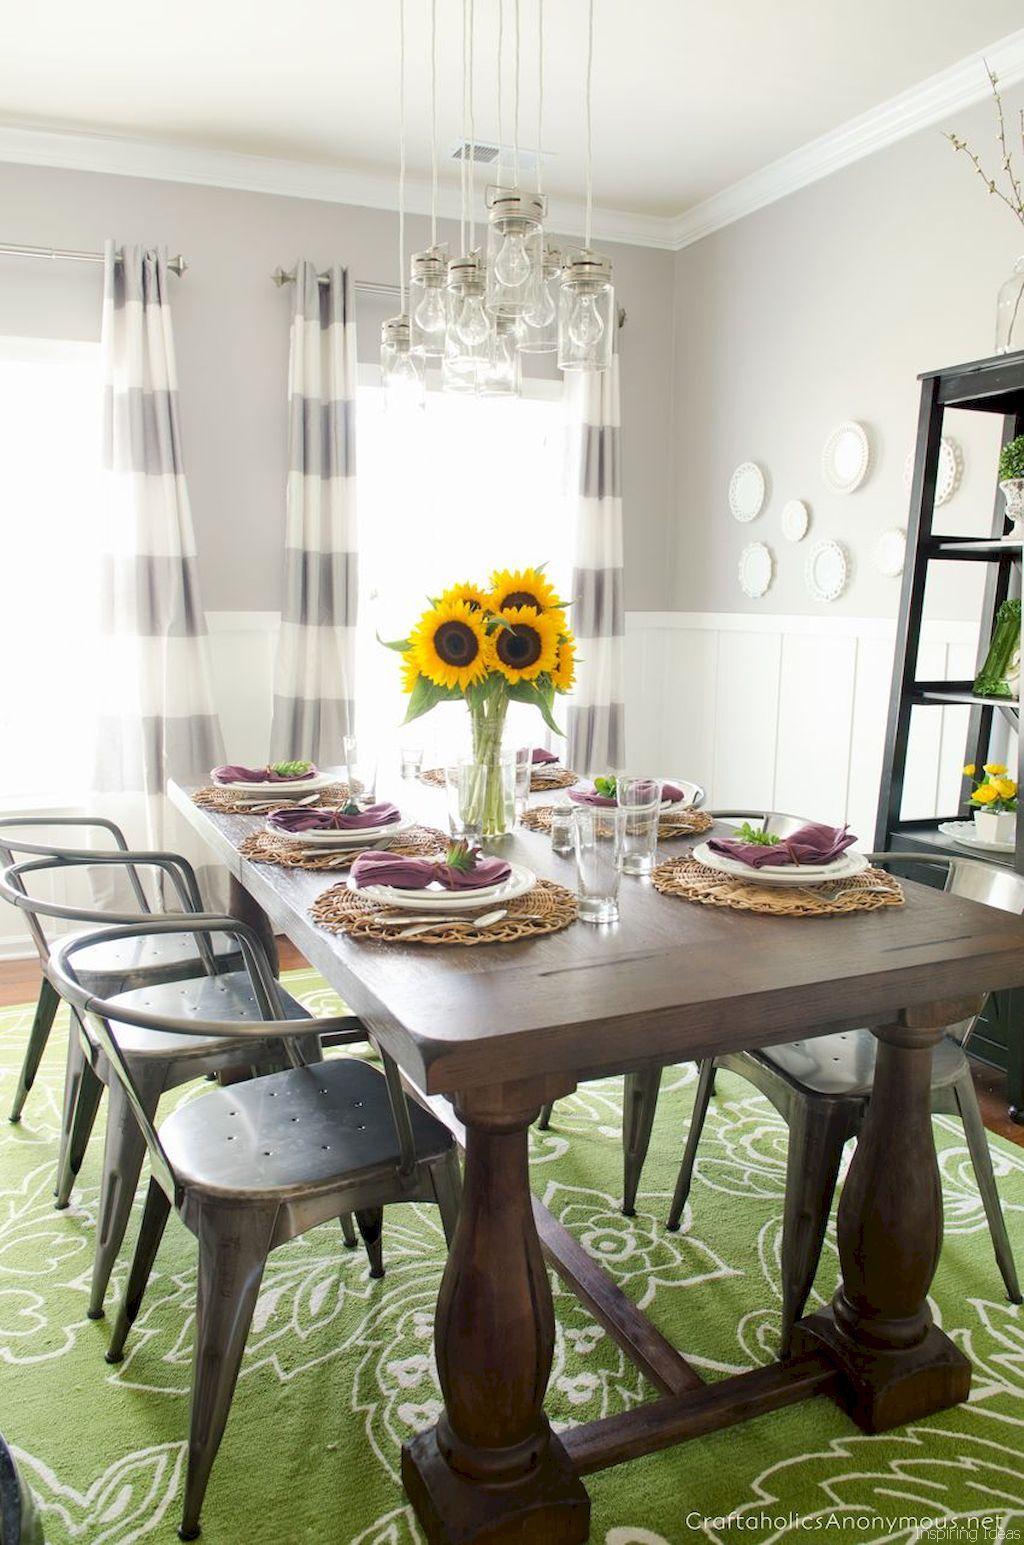 60 stunning farmhouse style dining room decorating ideas